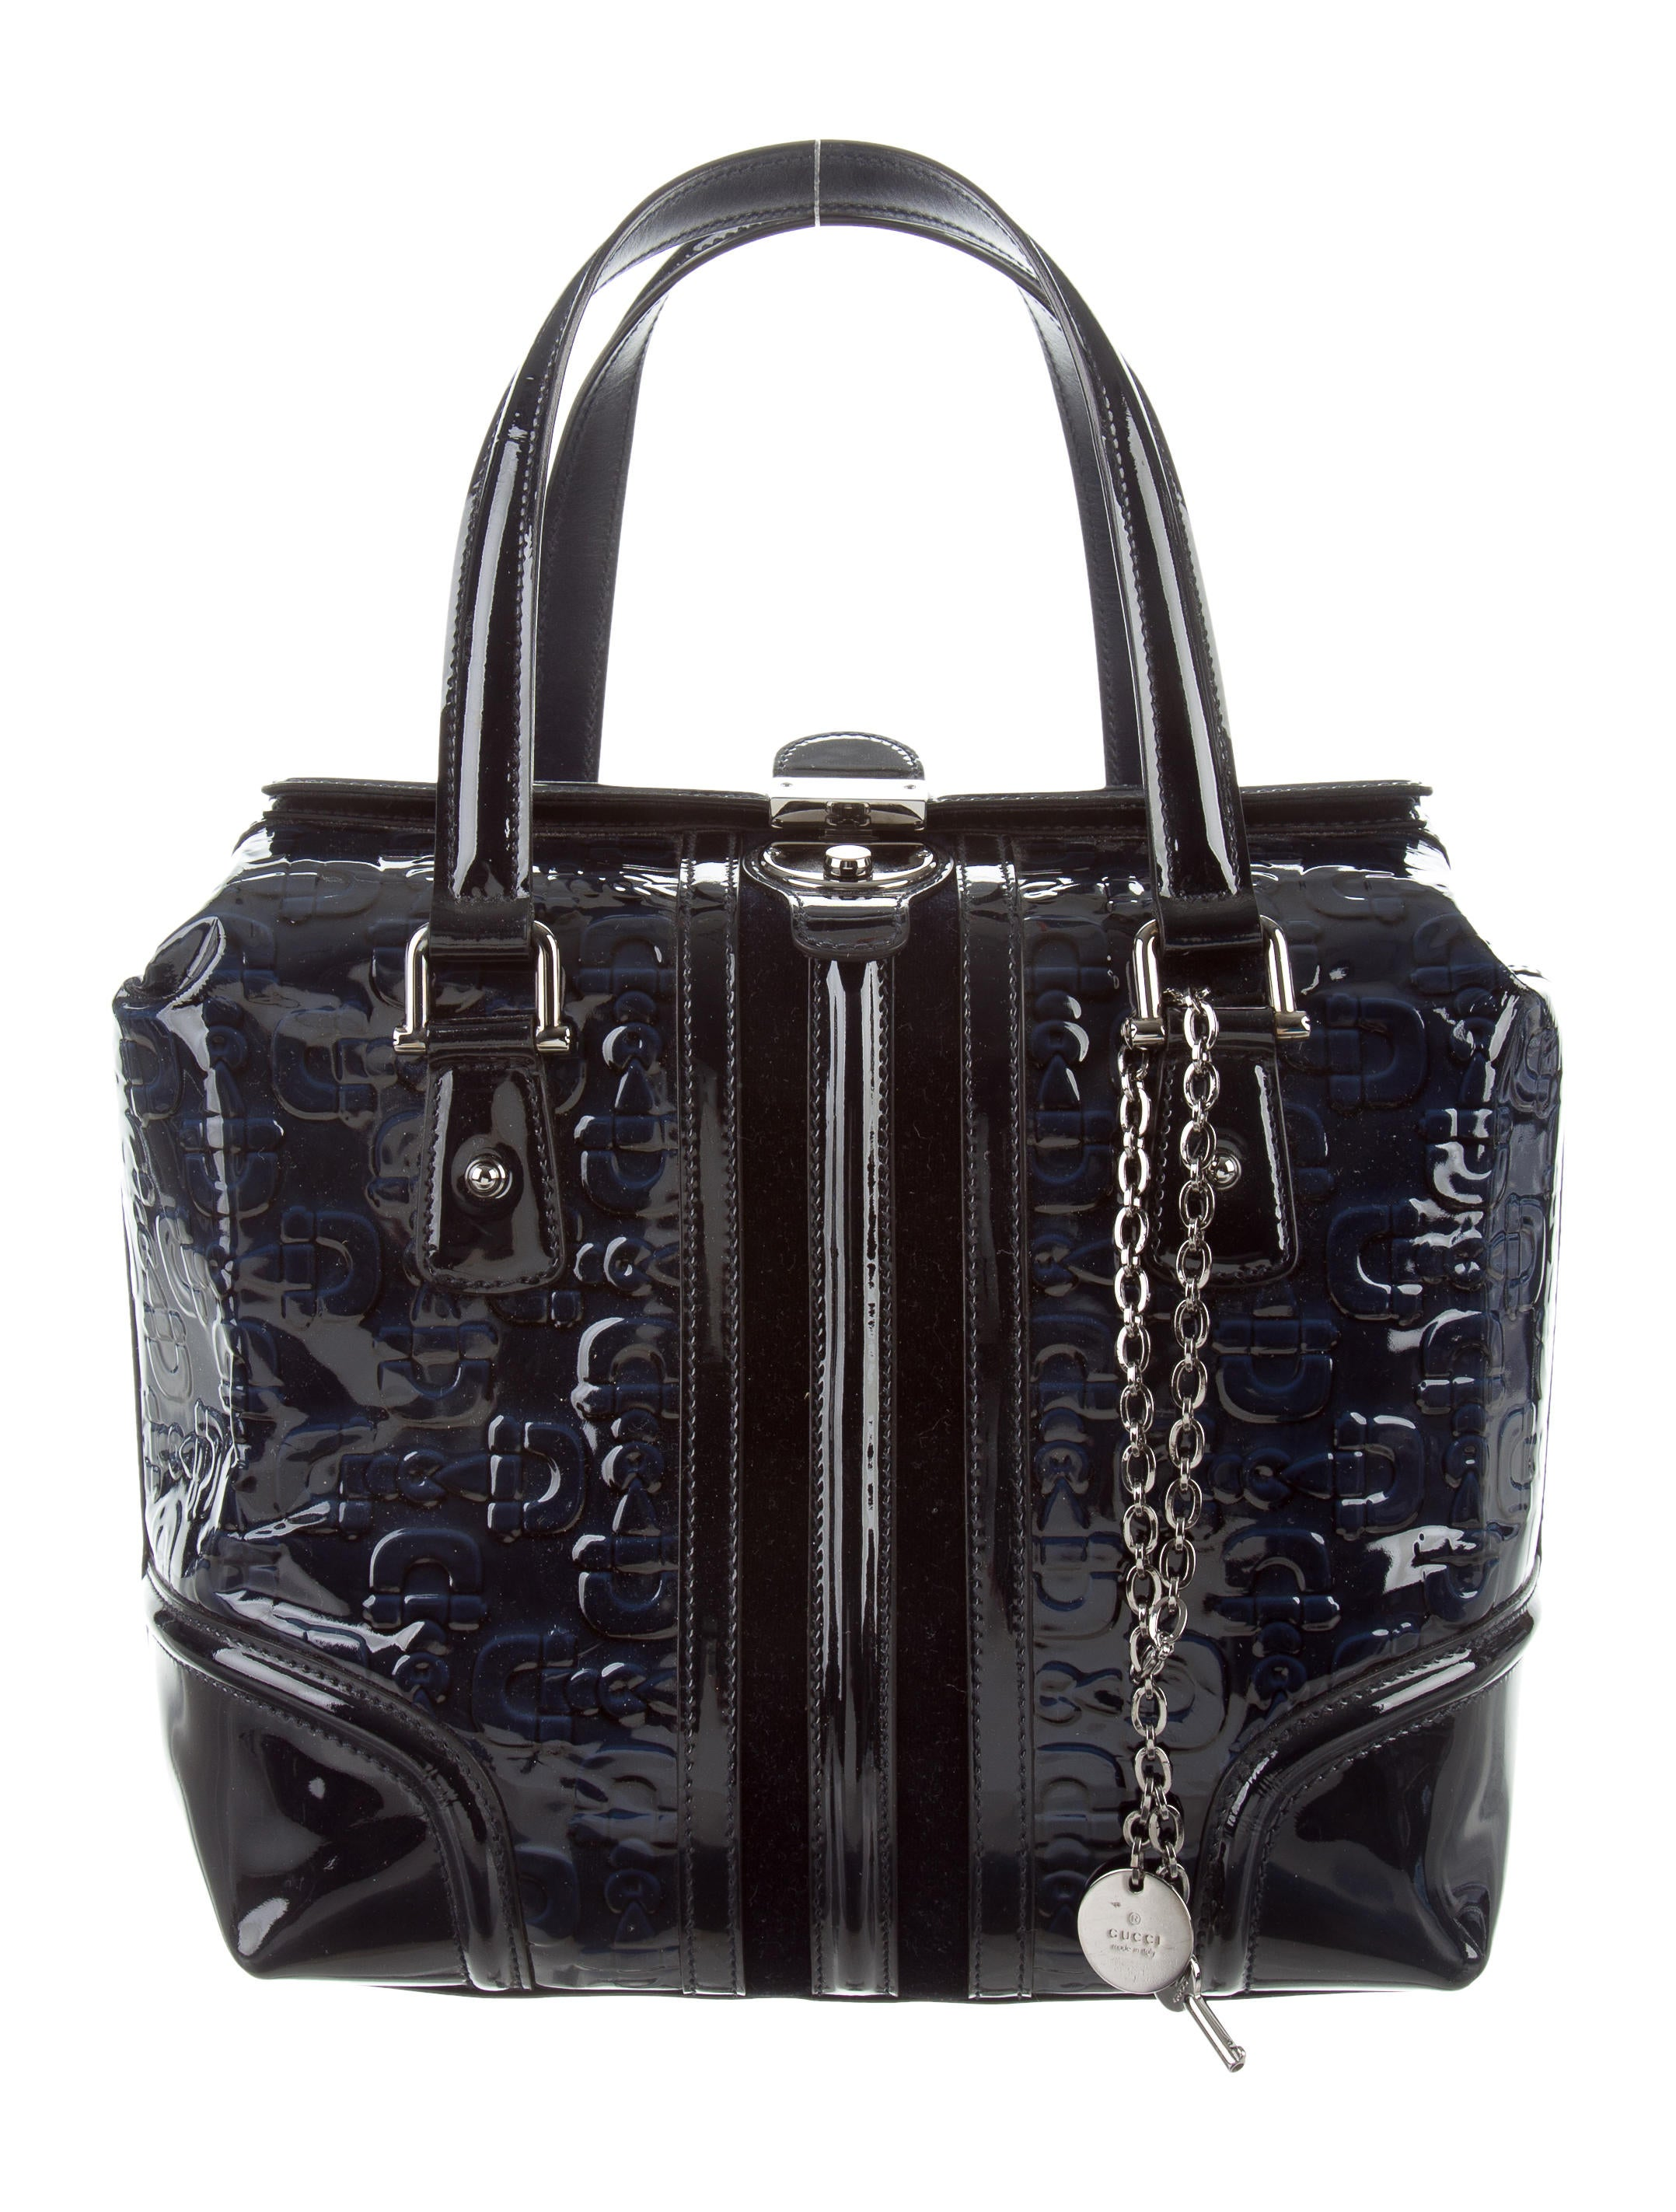 Boston Bag Patchwork Tutorial: Gucci Treasure Boston Bag - Handbags - GUC167667